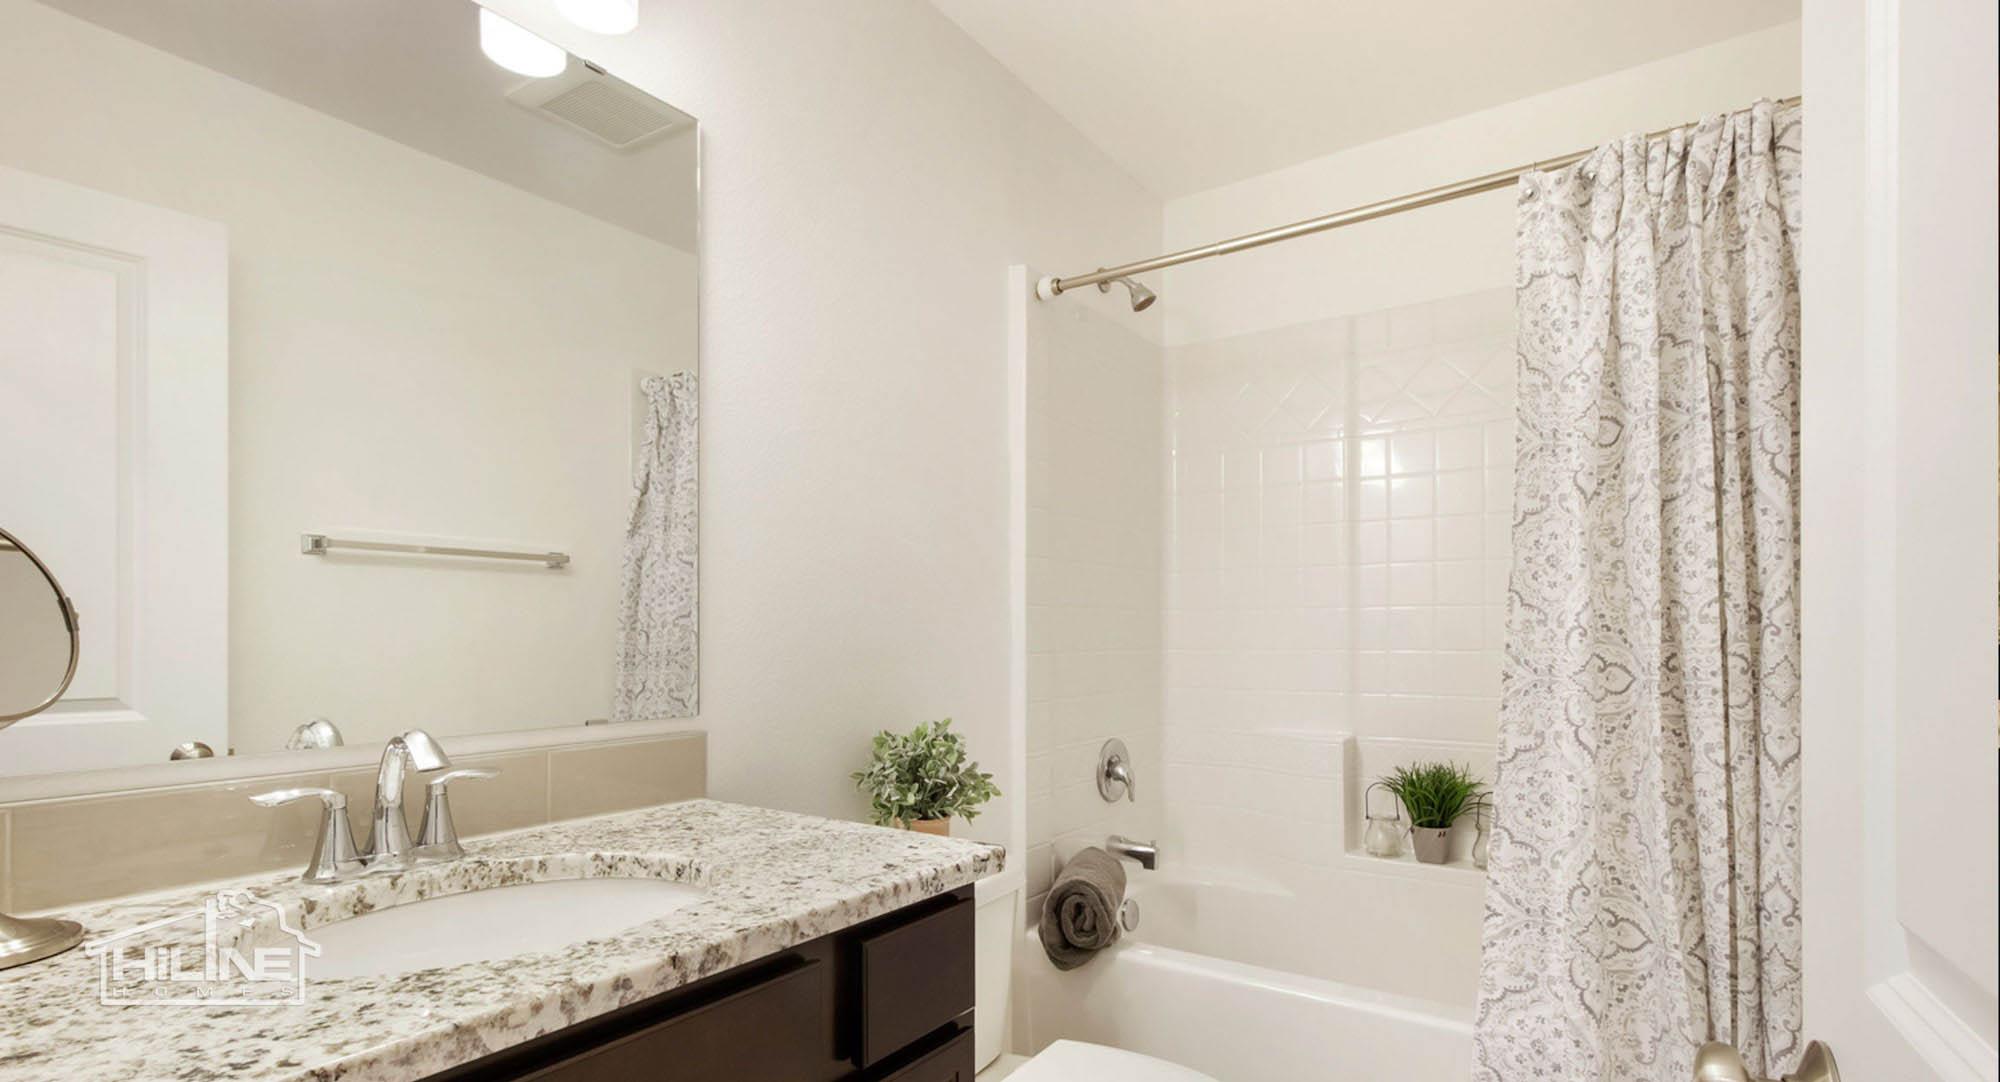 HiLine Home Plan 1491 Guest Bathroom